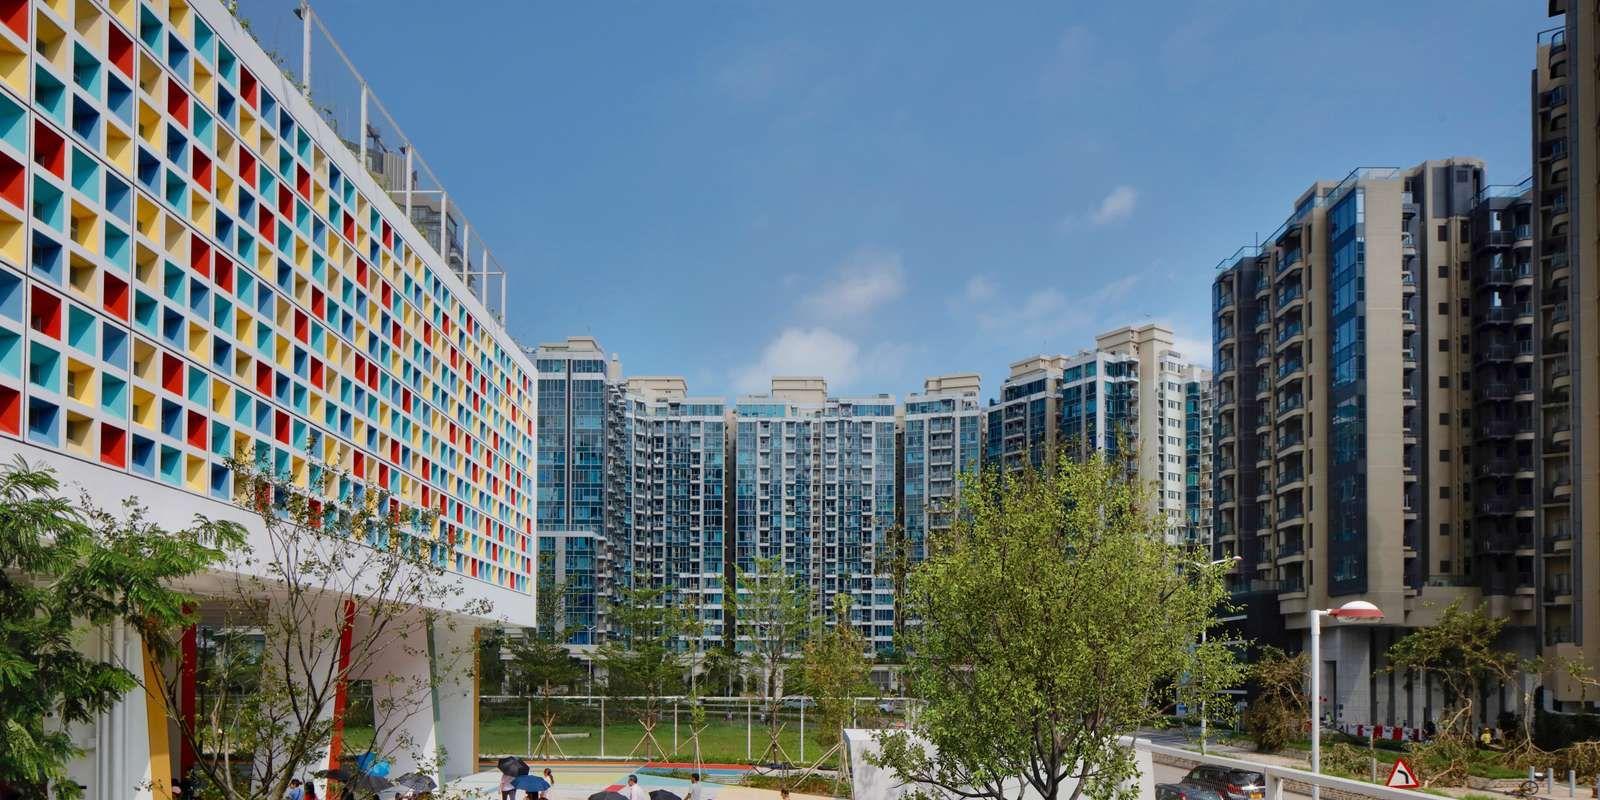 Scuola Internazionale Francese di Hong Kong, Henning Larsen